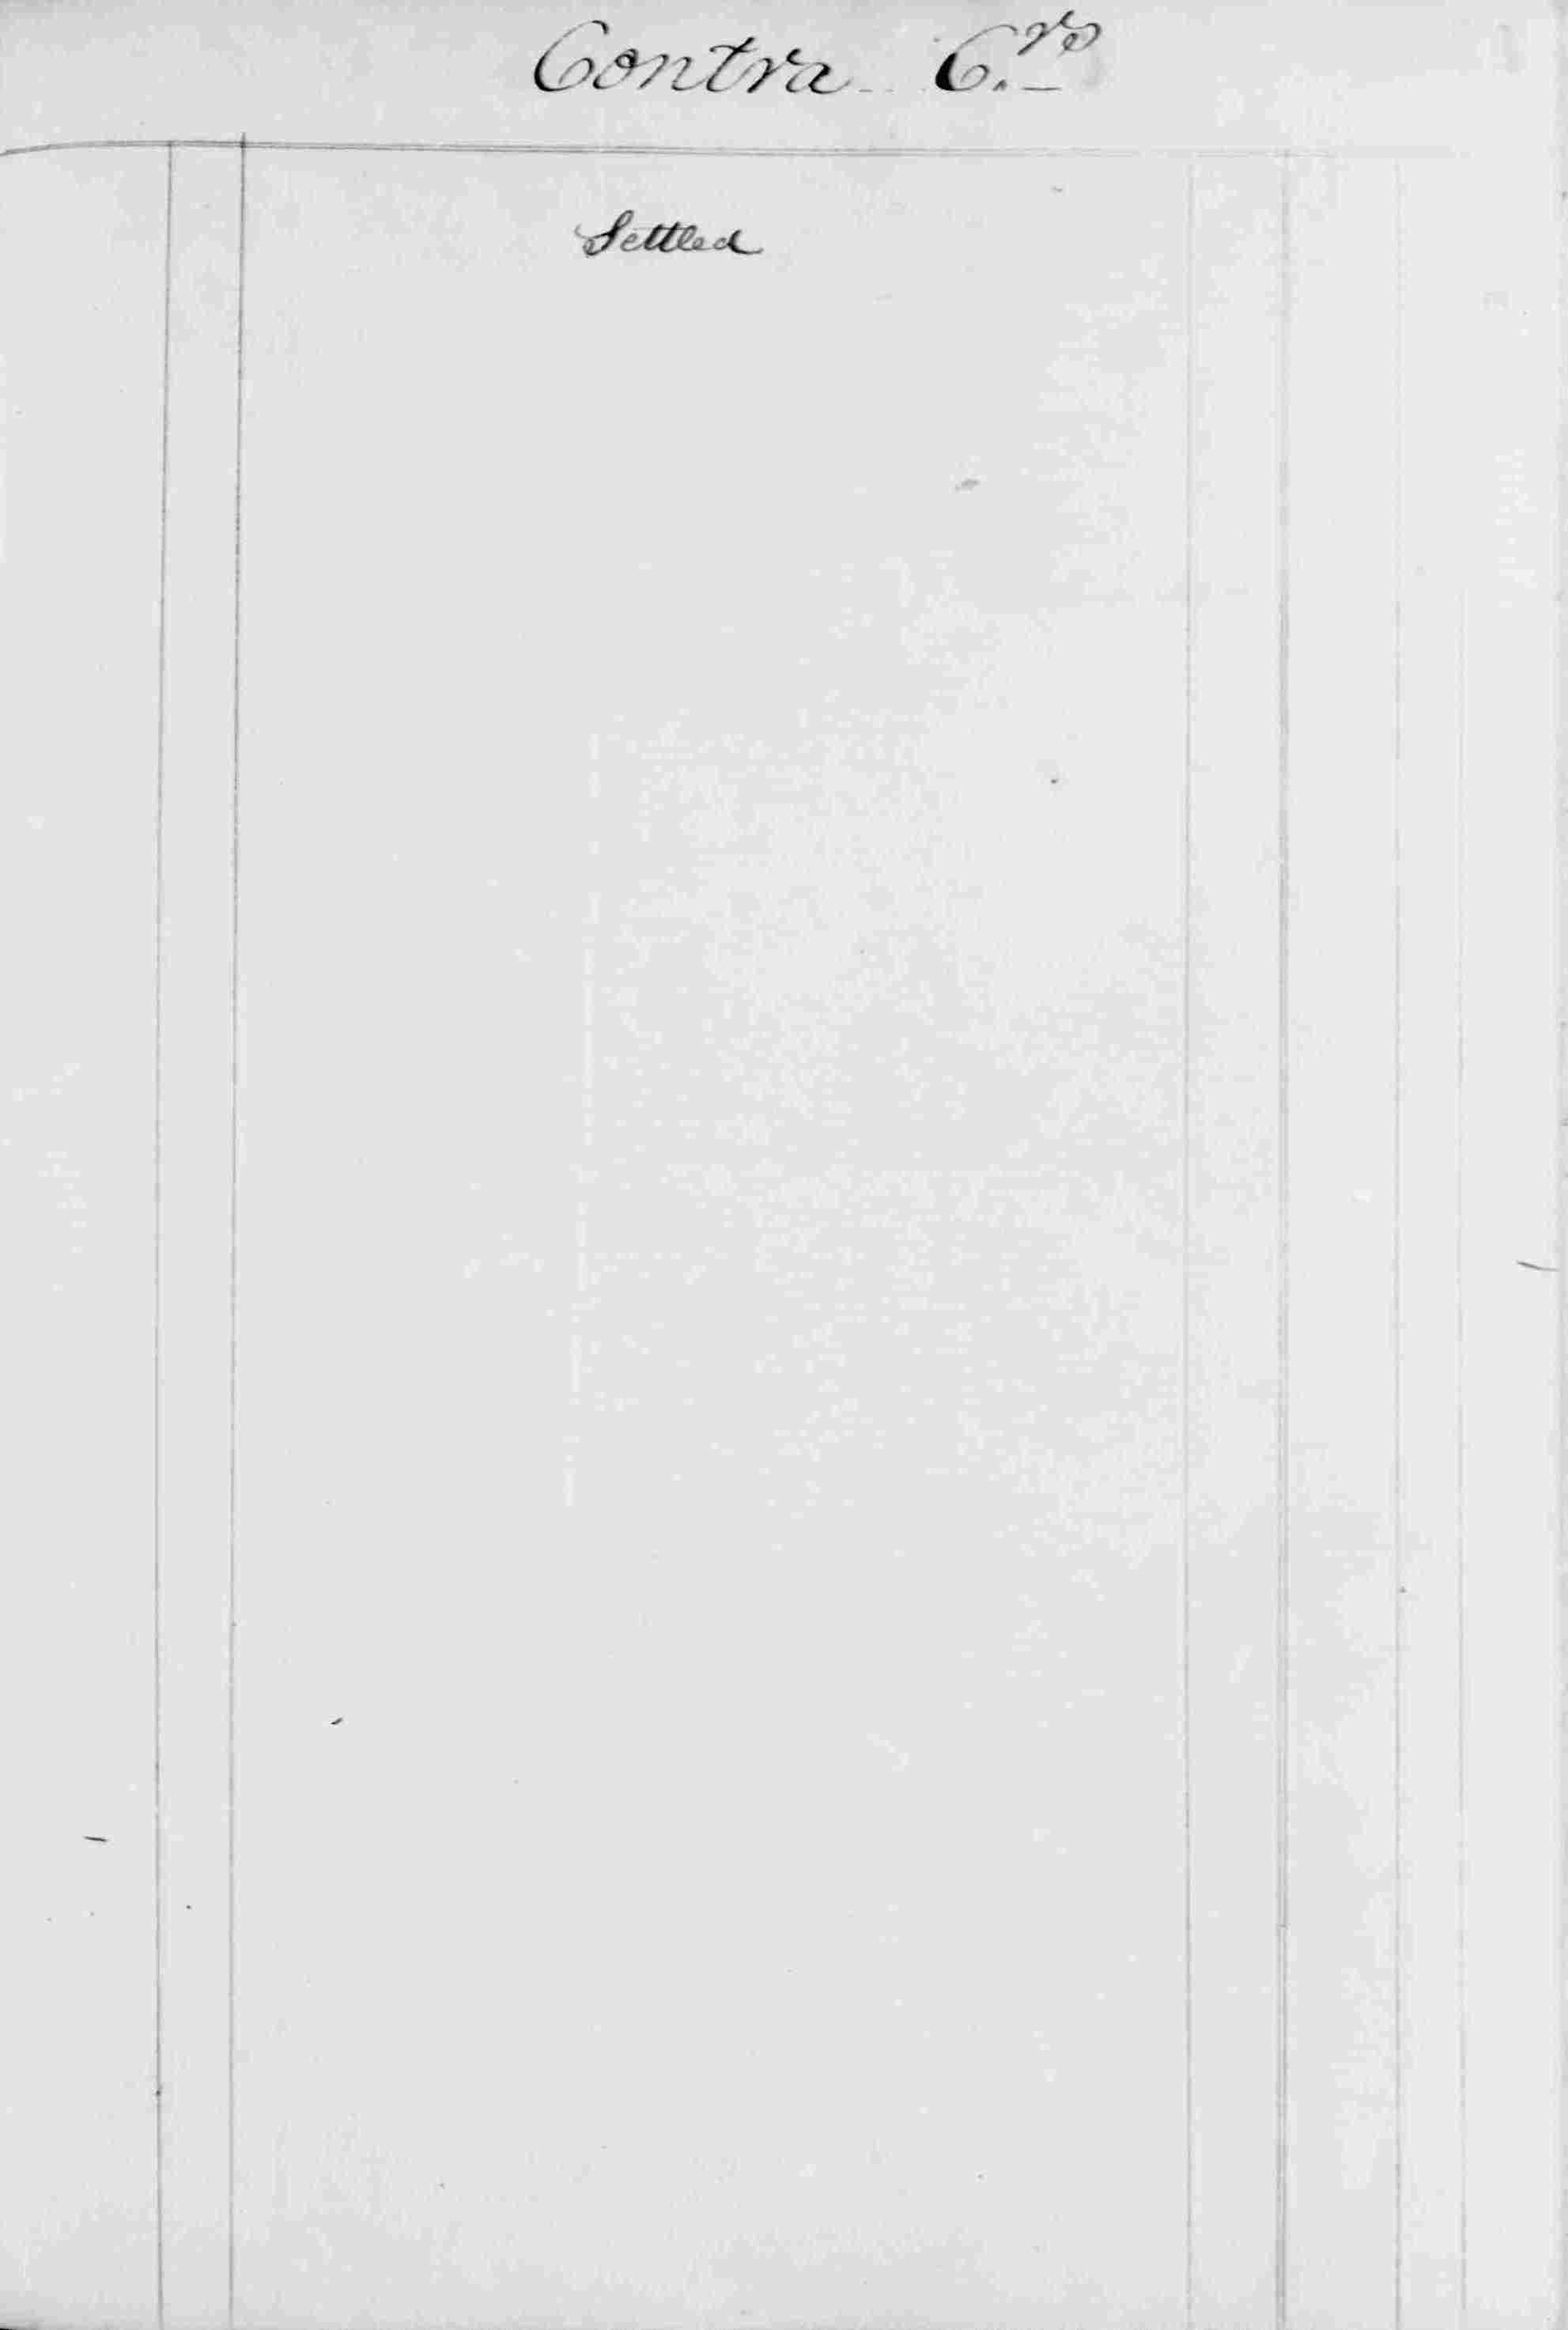 Ledger B, folio 124, right side